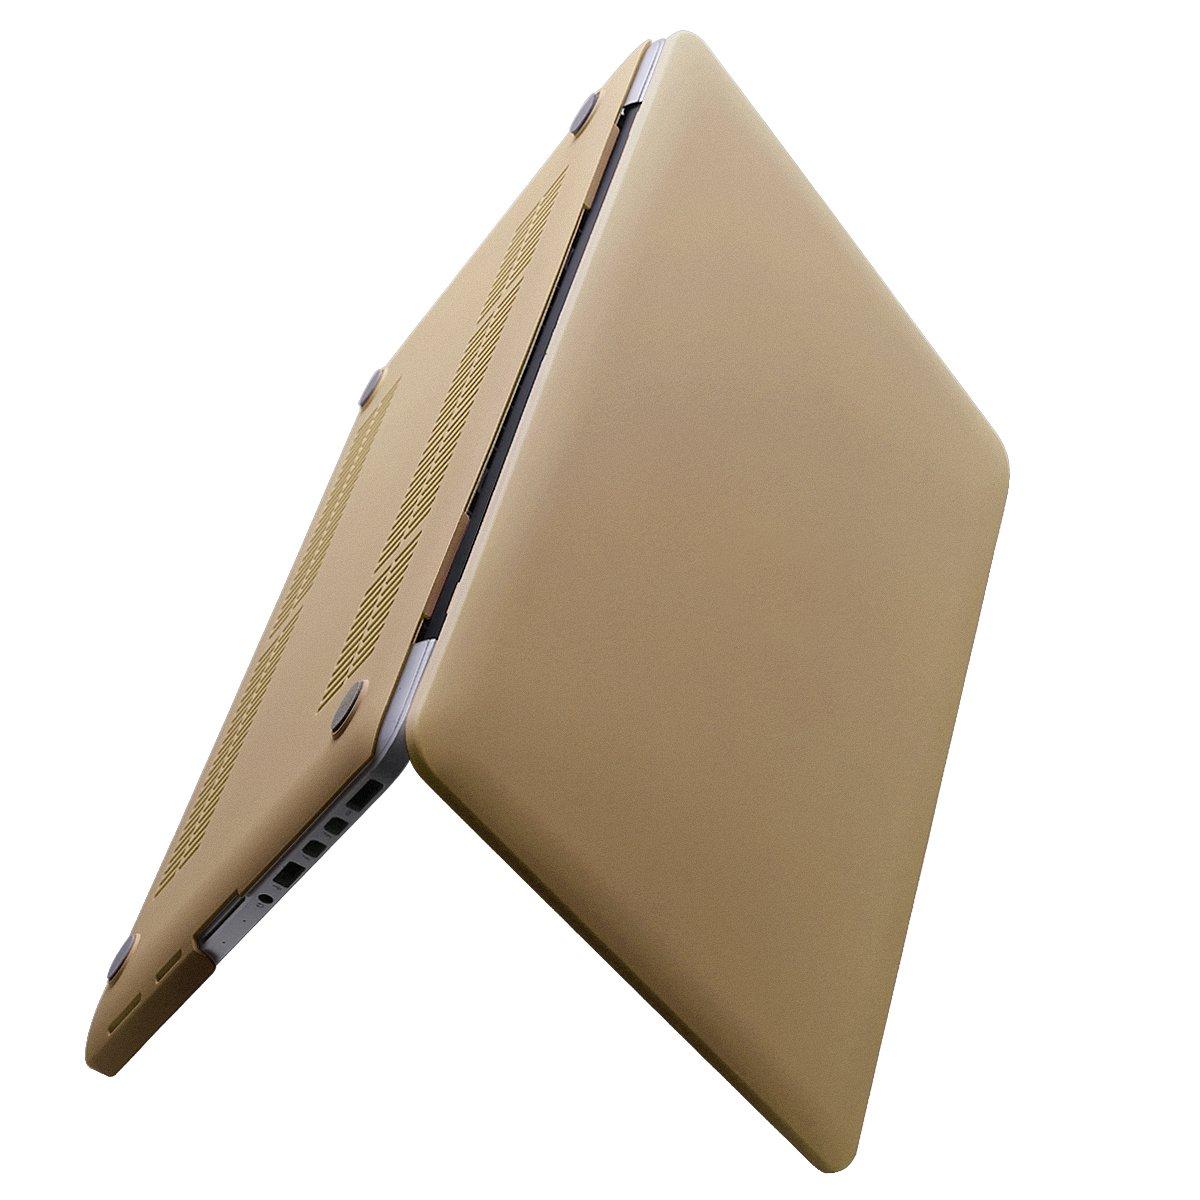 MacBook Pro 13 Retinaケース(CD-ROMドライブなし) - MacBook Pro用SoundmadスムーズソフトPUレザーコートハードシェル保護ケースカバーRetinaディスプレイ付き13.3インチ (Macbook Retina 13 inch, Gold) B072SL9W7R Gold Gold